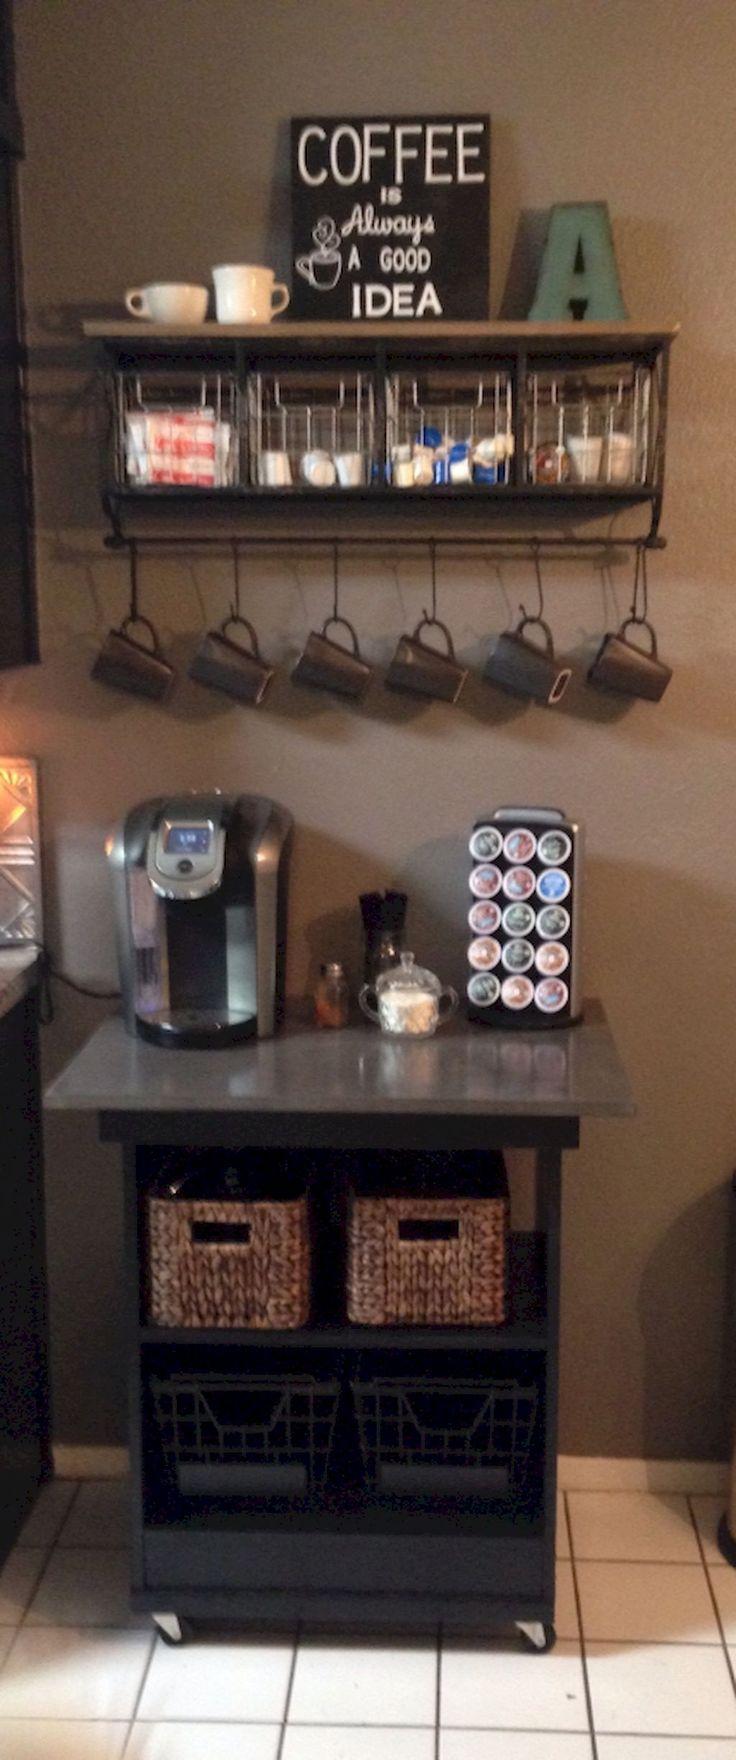 Adorable 35 DIY Mini Coffee Bar Ideas for Your Home https://lovelyving.com/2017/09/18/35-diy-mini-coffee-bar-ideas-home/